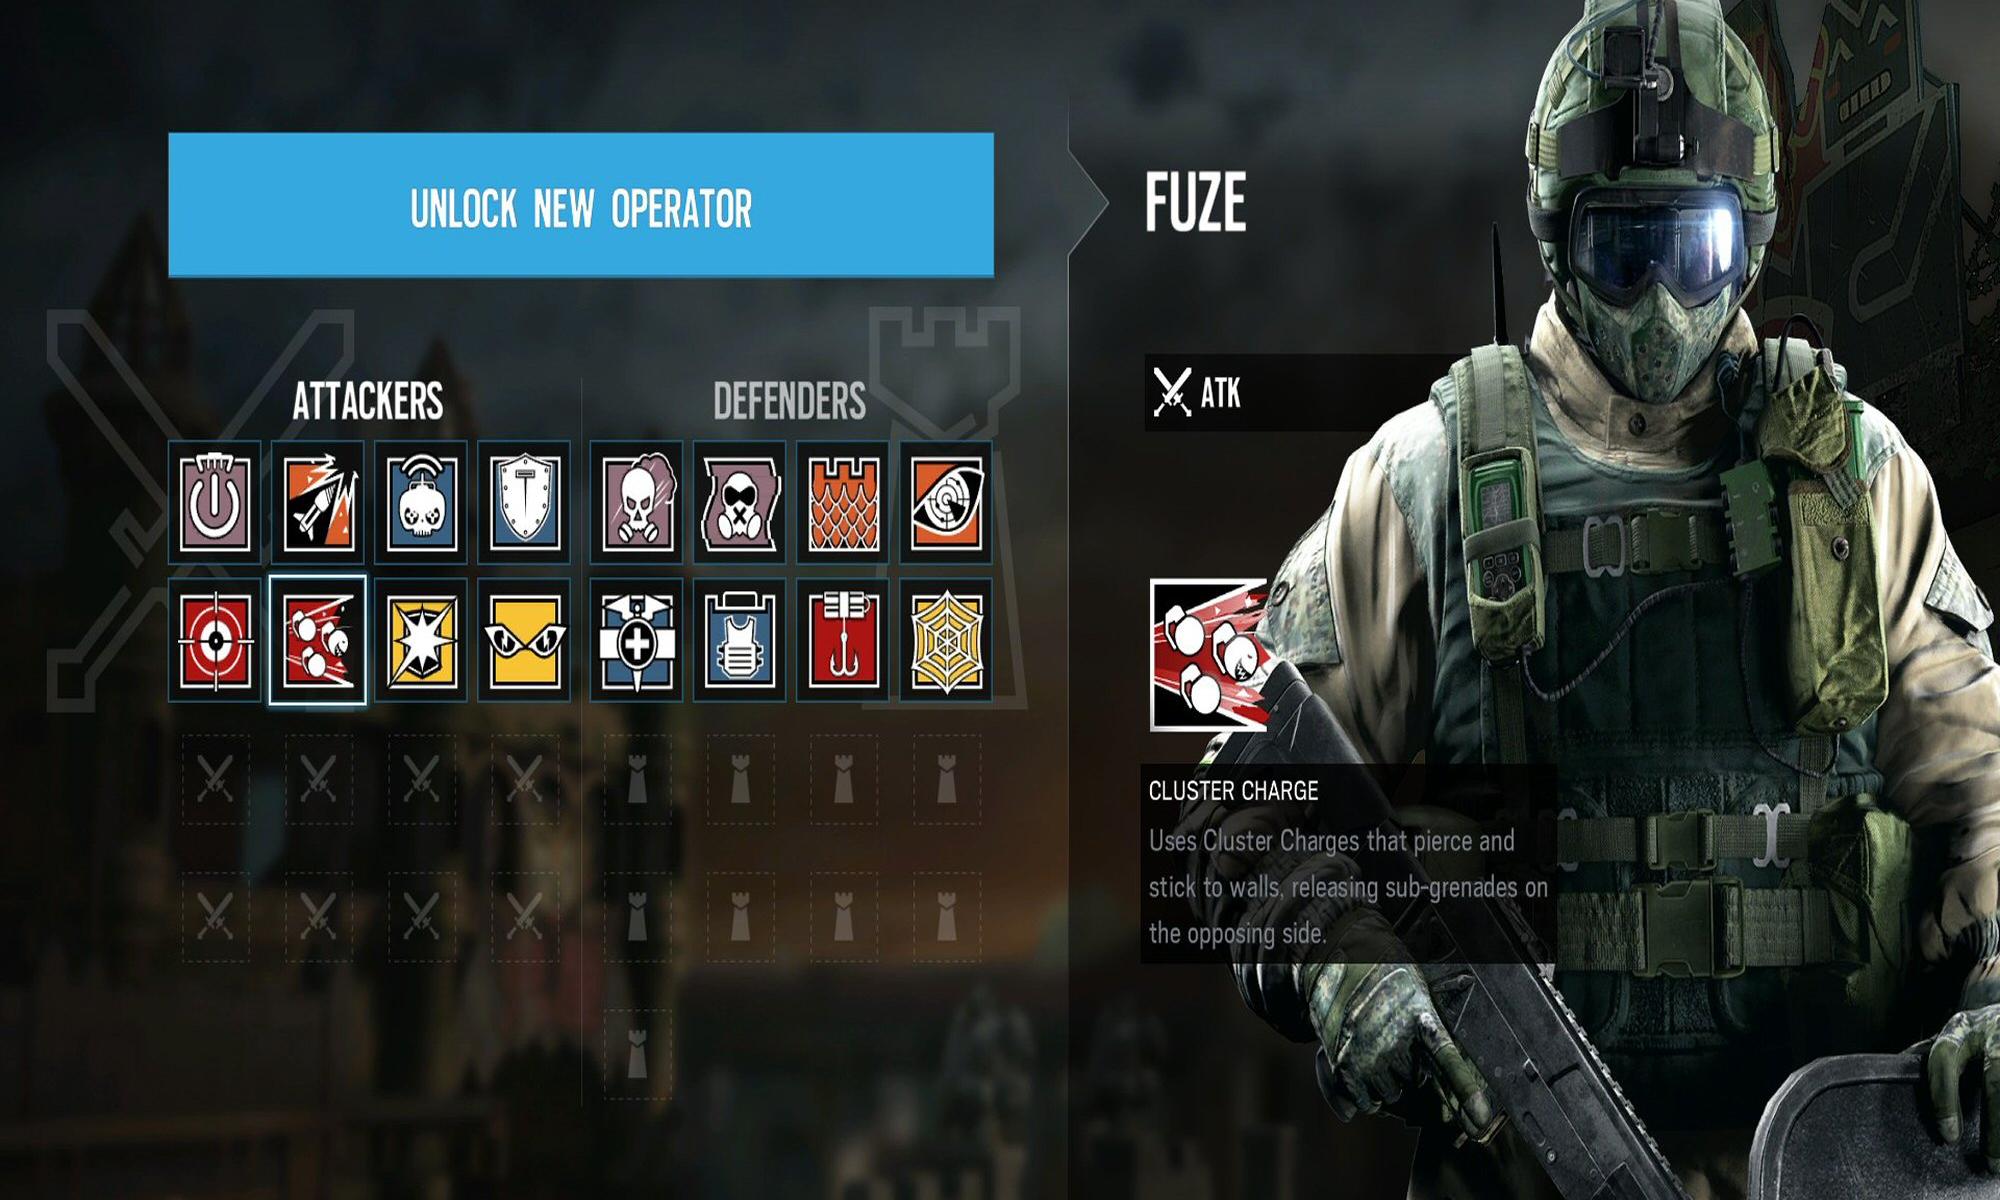 How To Play Fuze Rainbow Six Siege Gamehag